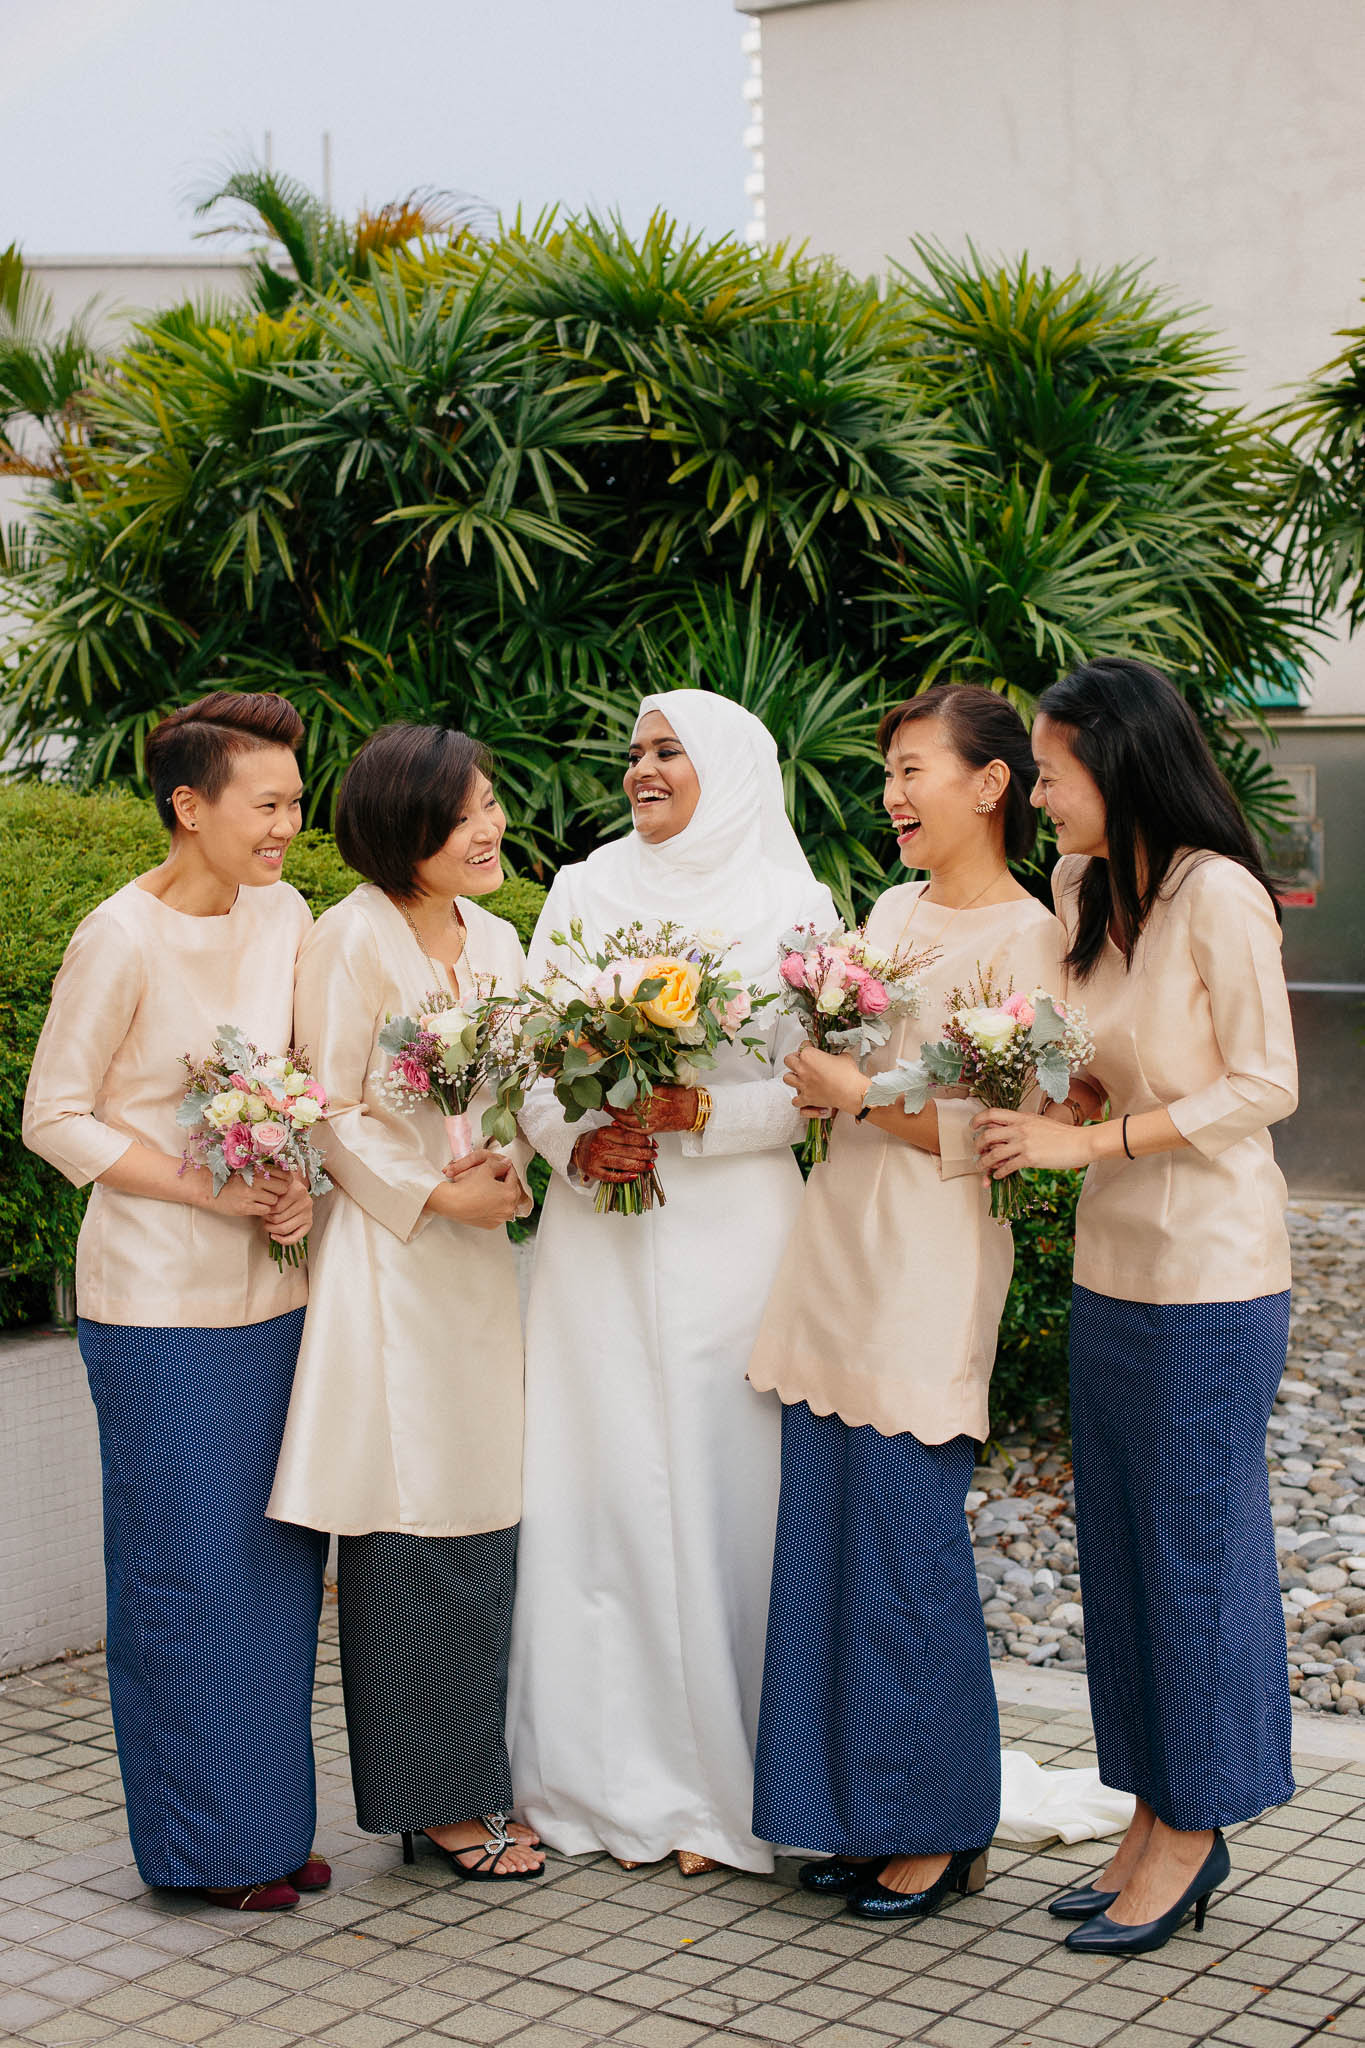 singapore-wedding-photographer-malay-indian-pre-wedding-travel-wmt-2015-shereen-farid-45.jpg